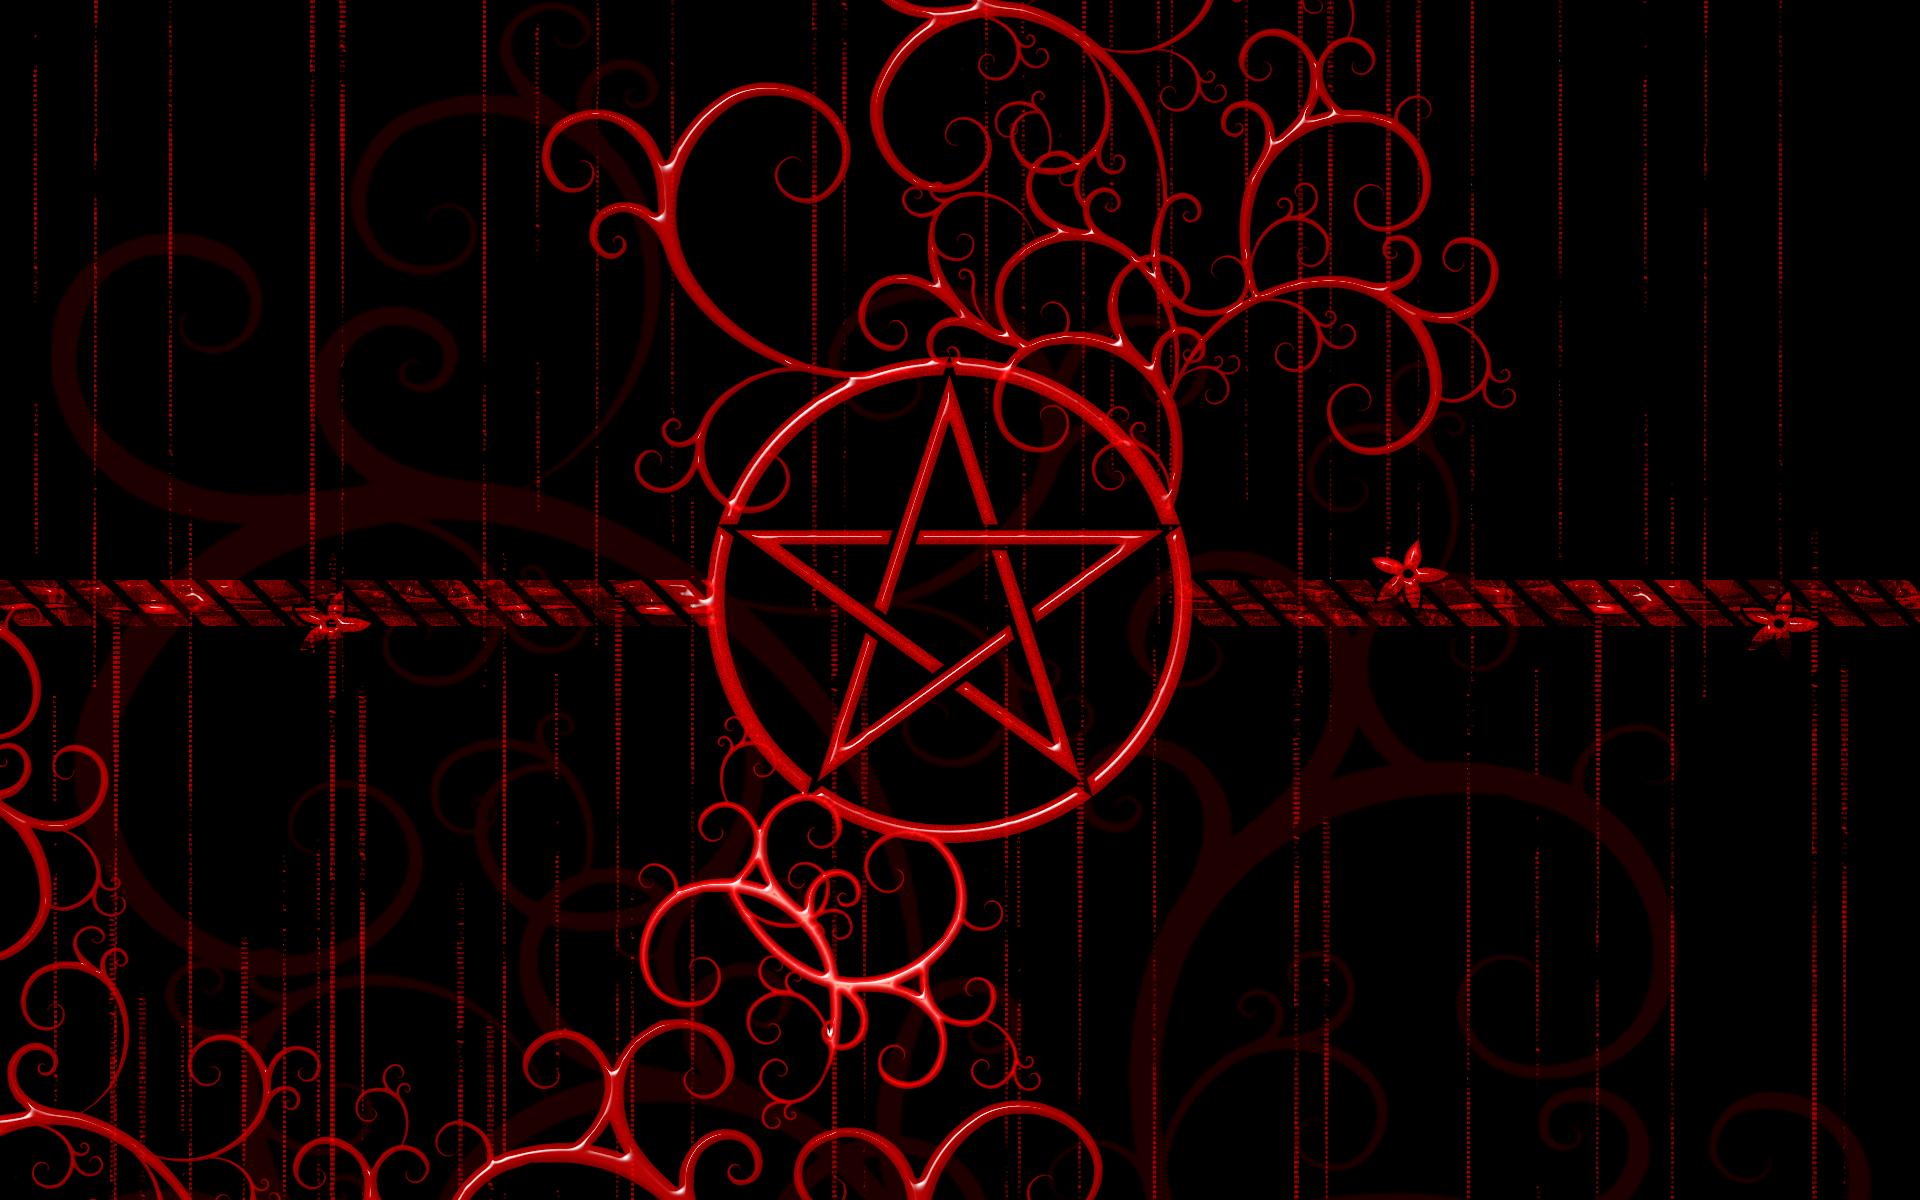 Dark horror evil symbol satan penta star wallpaper 1920x1200 dark horror evil symbol satan penta star wallpaper 1920x1200 29733 wallpaperup biocorpaavc Choice Image